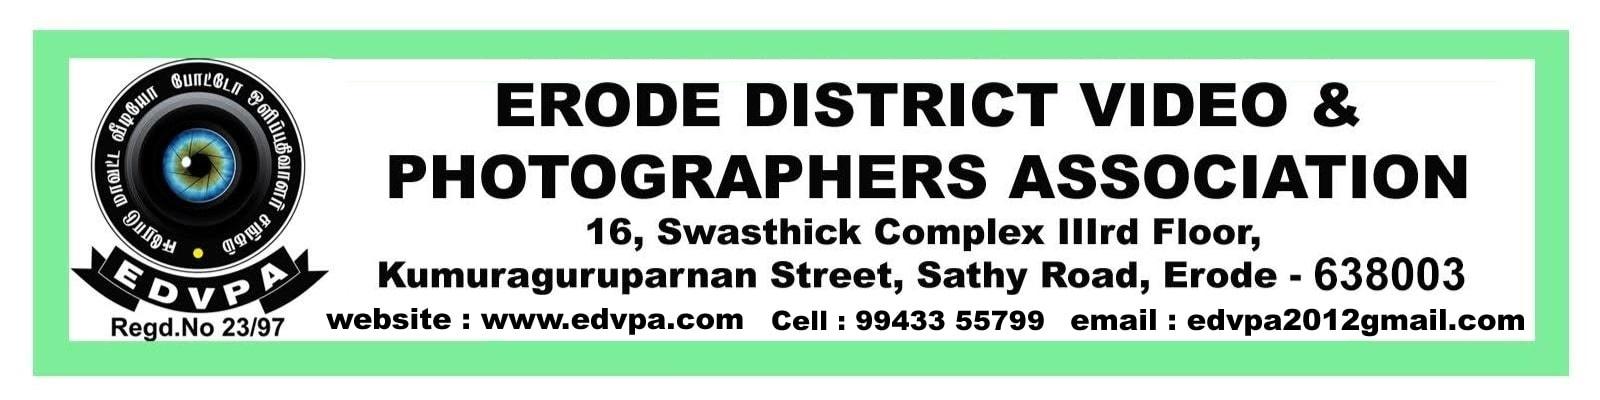 Erode District Video & Photographers Association Logo